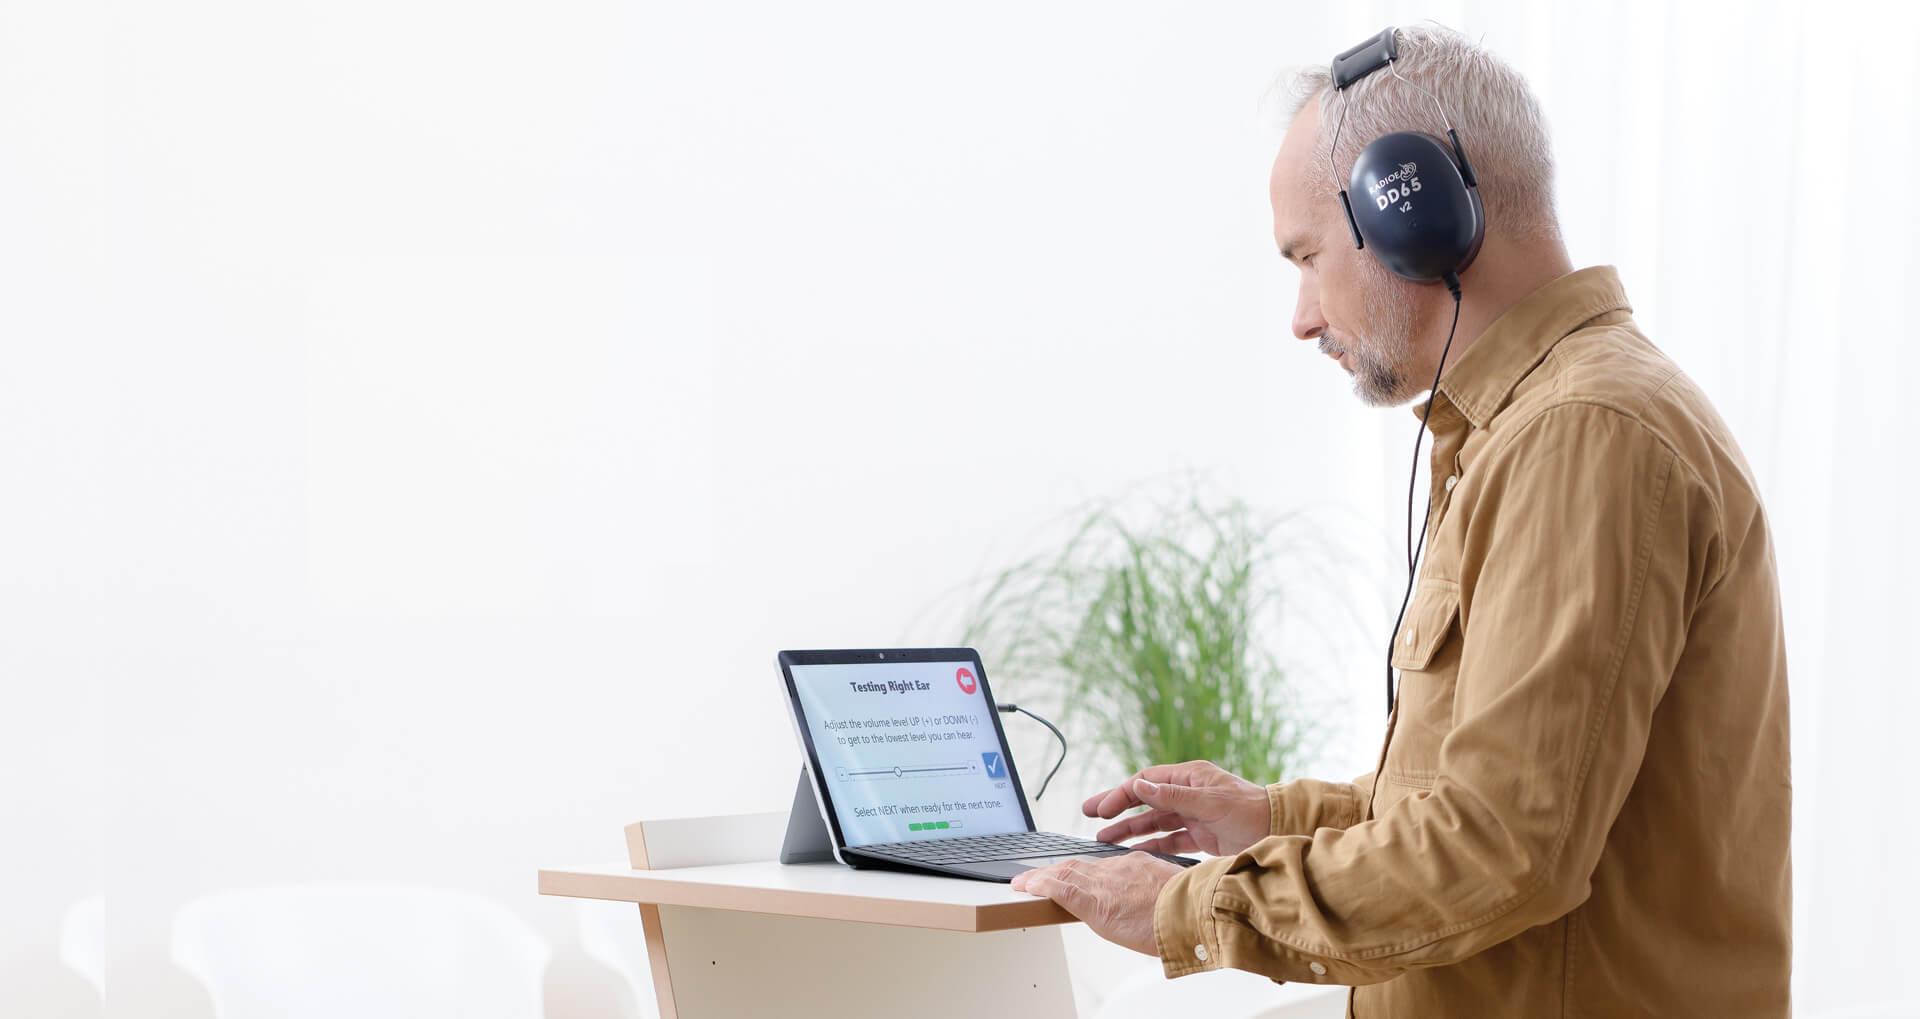 Kiosk - Hearing Screening Tablet